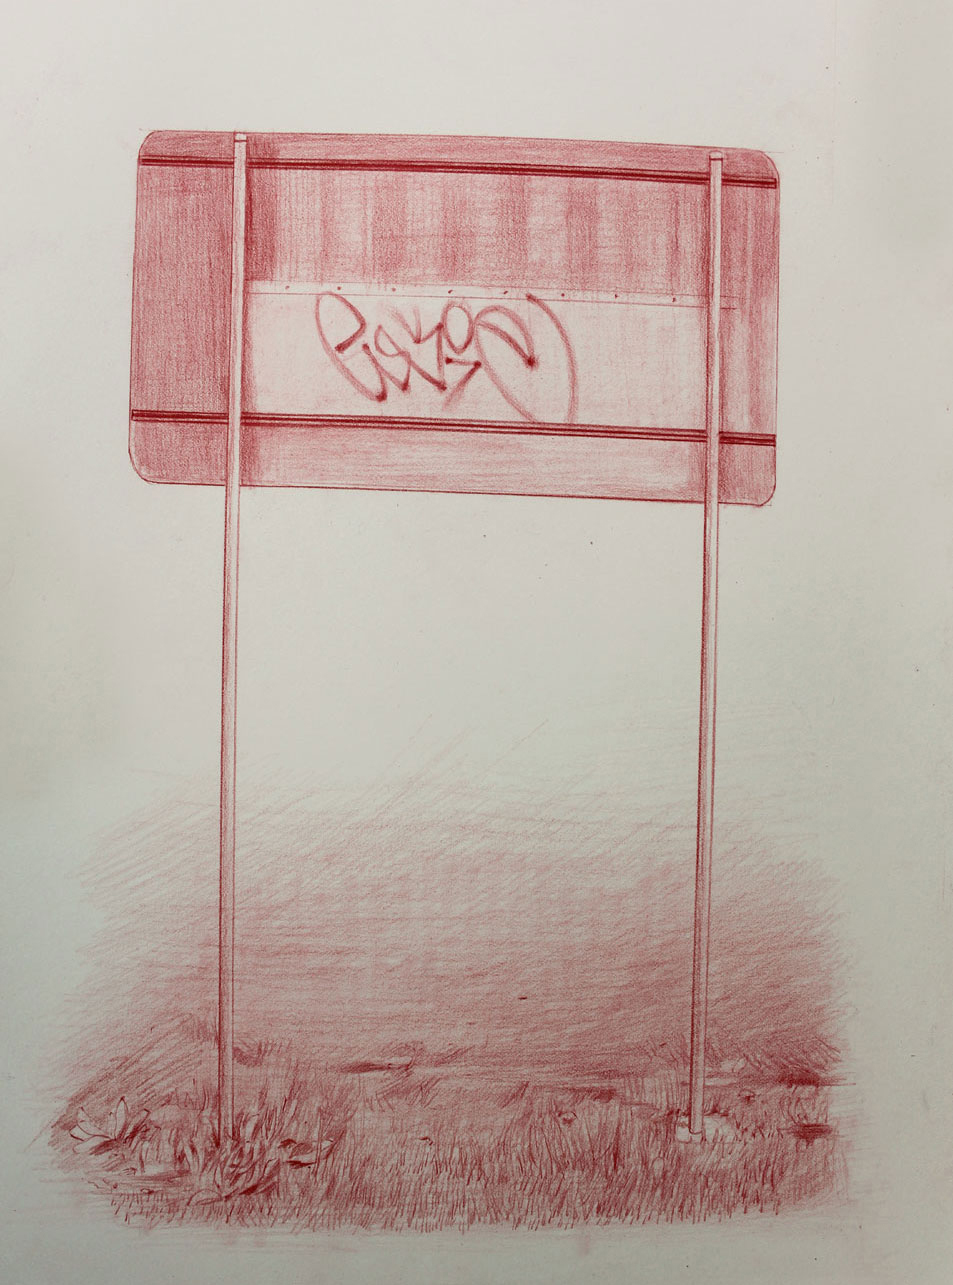 Vin Ryan,  Sign, Sunshine,  2012, pencil on paper, 38 x 28cm